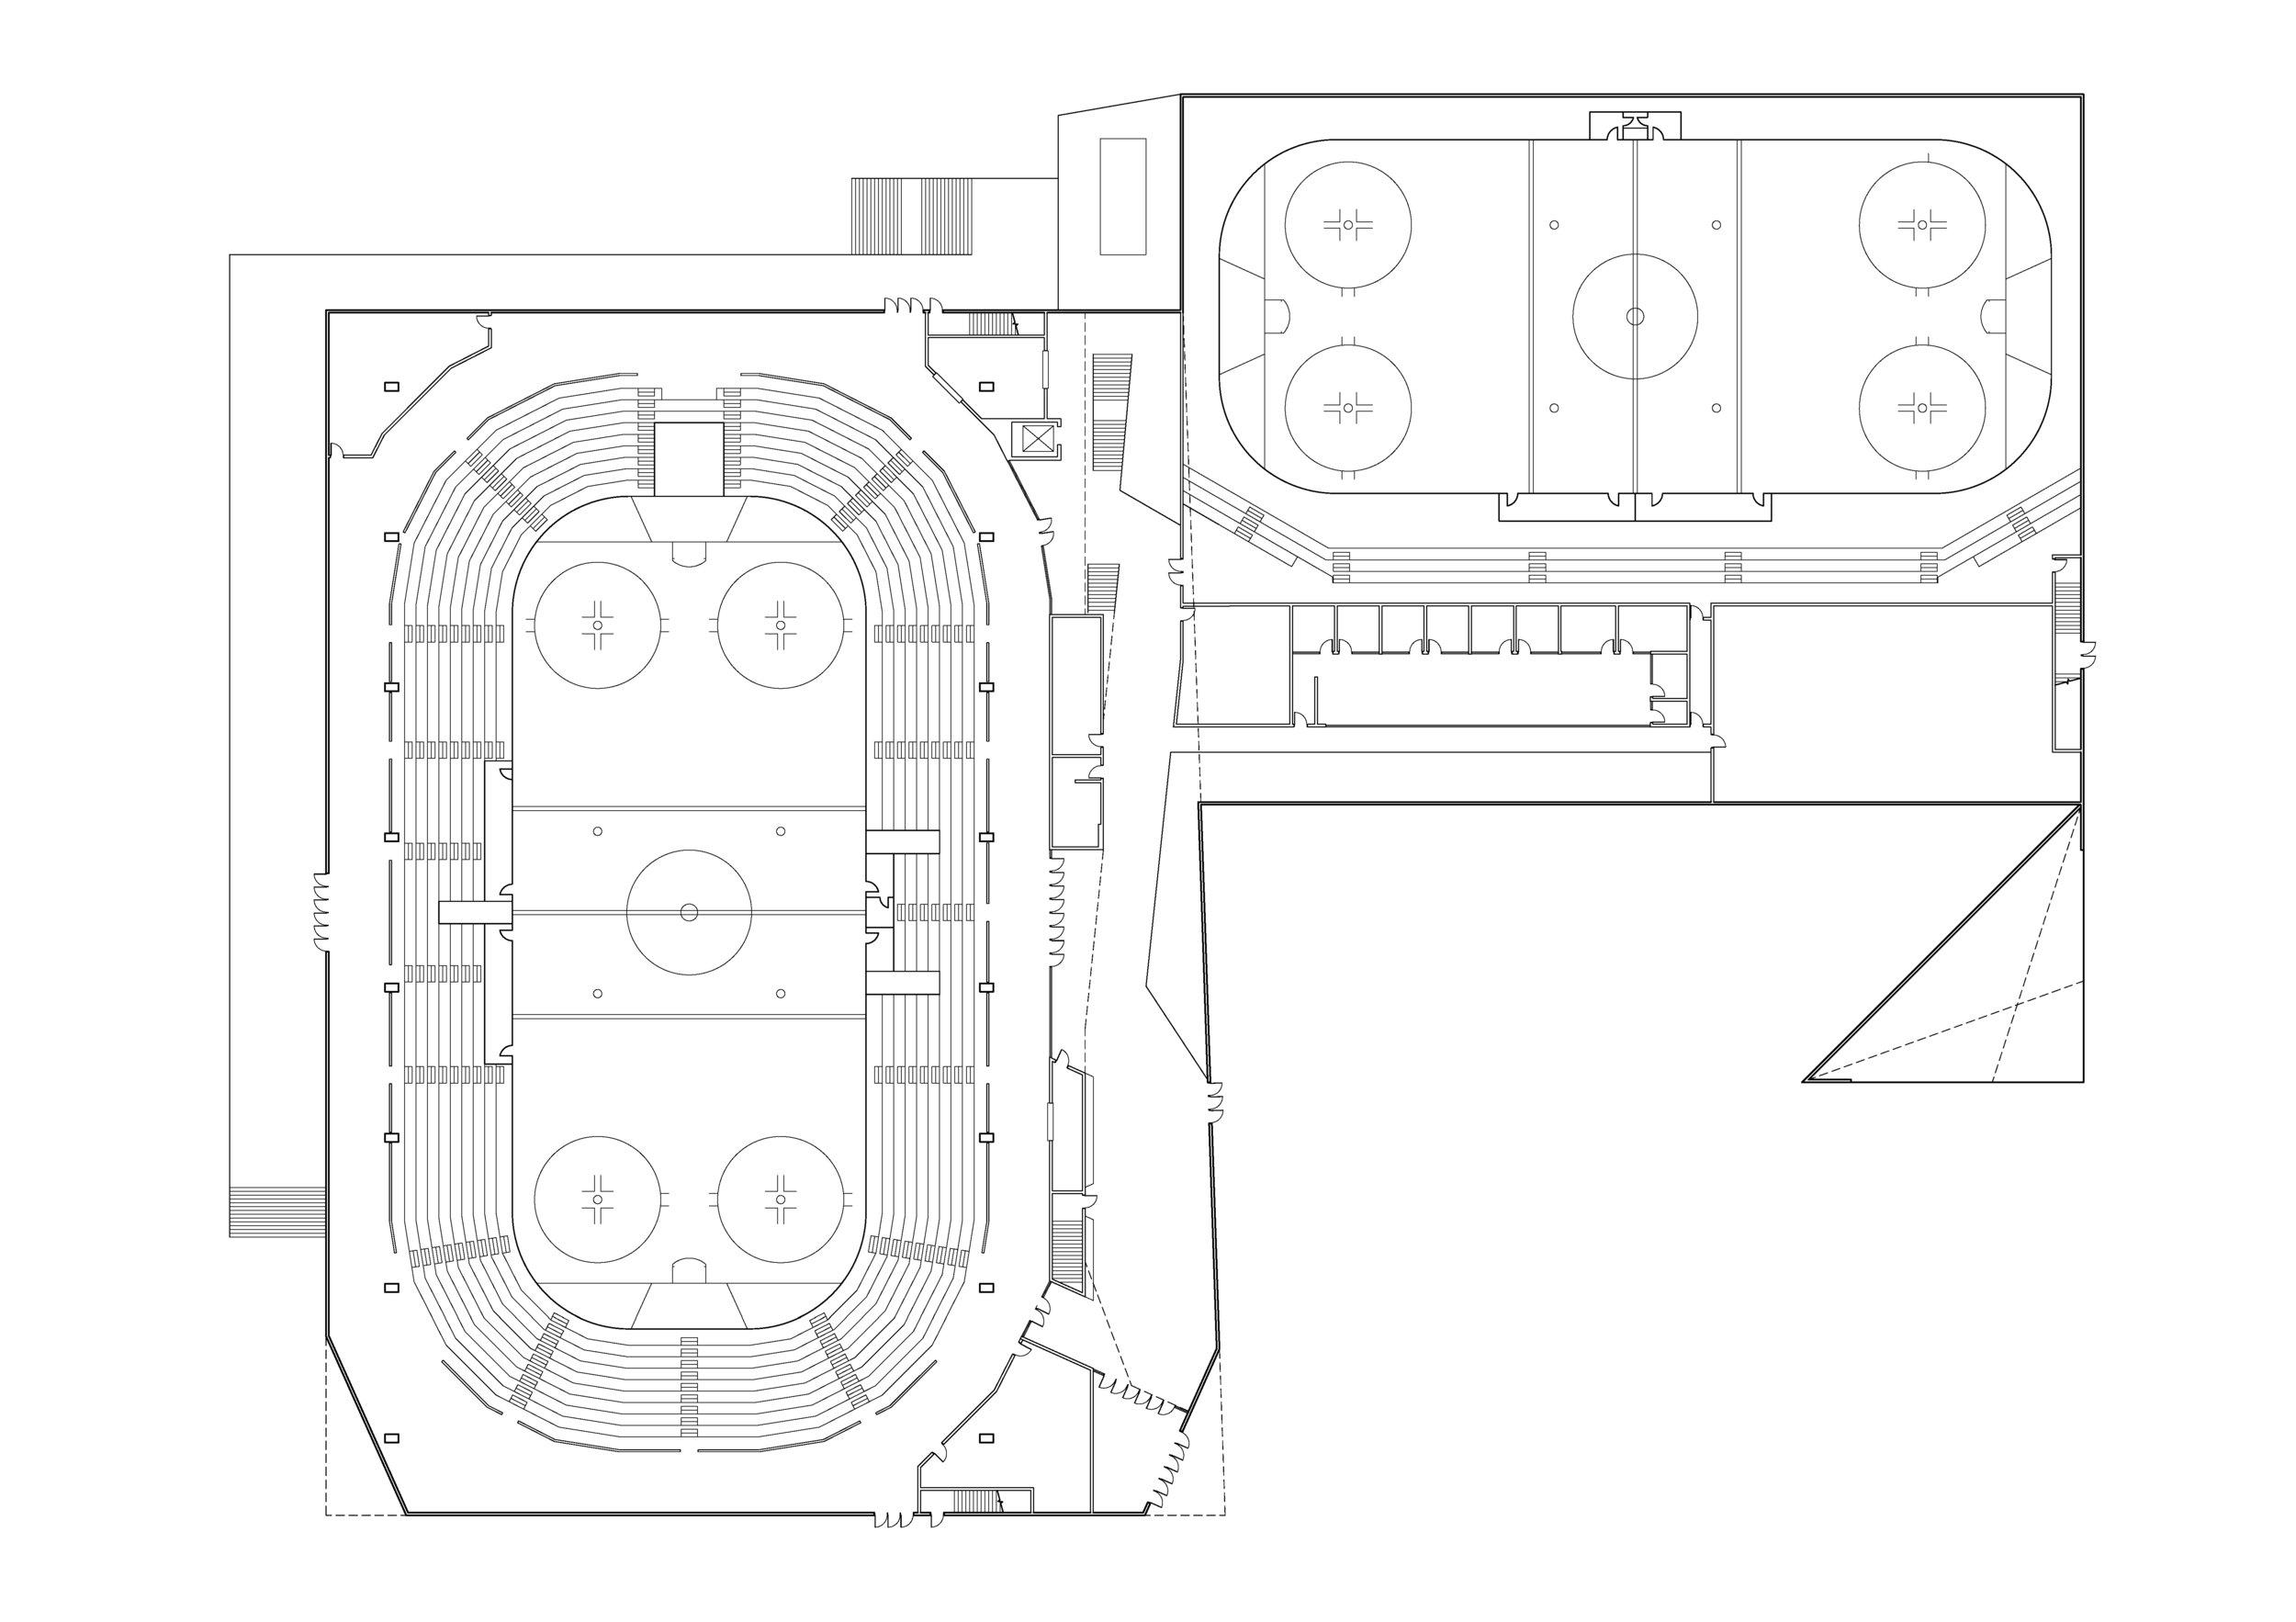 5594 - UofA Arena  - Concourse Plan.jpg